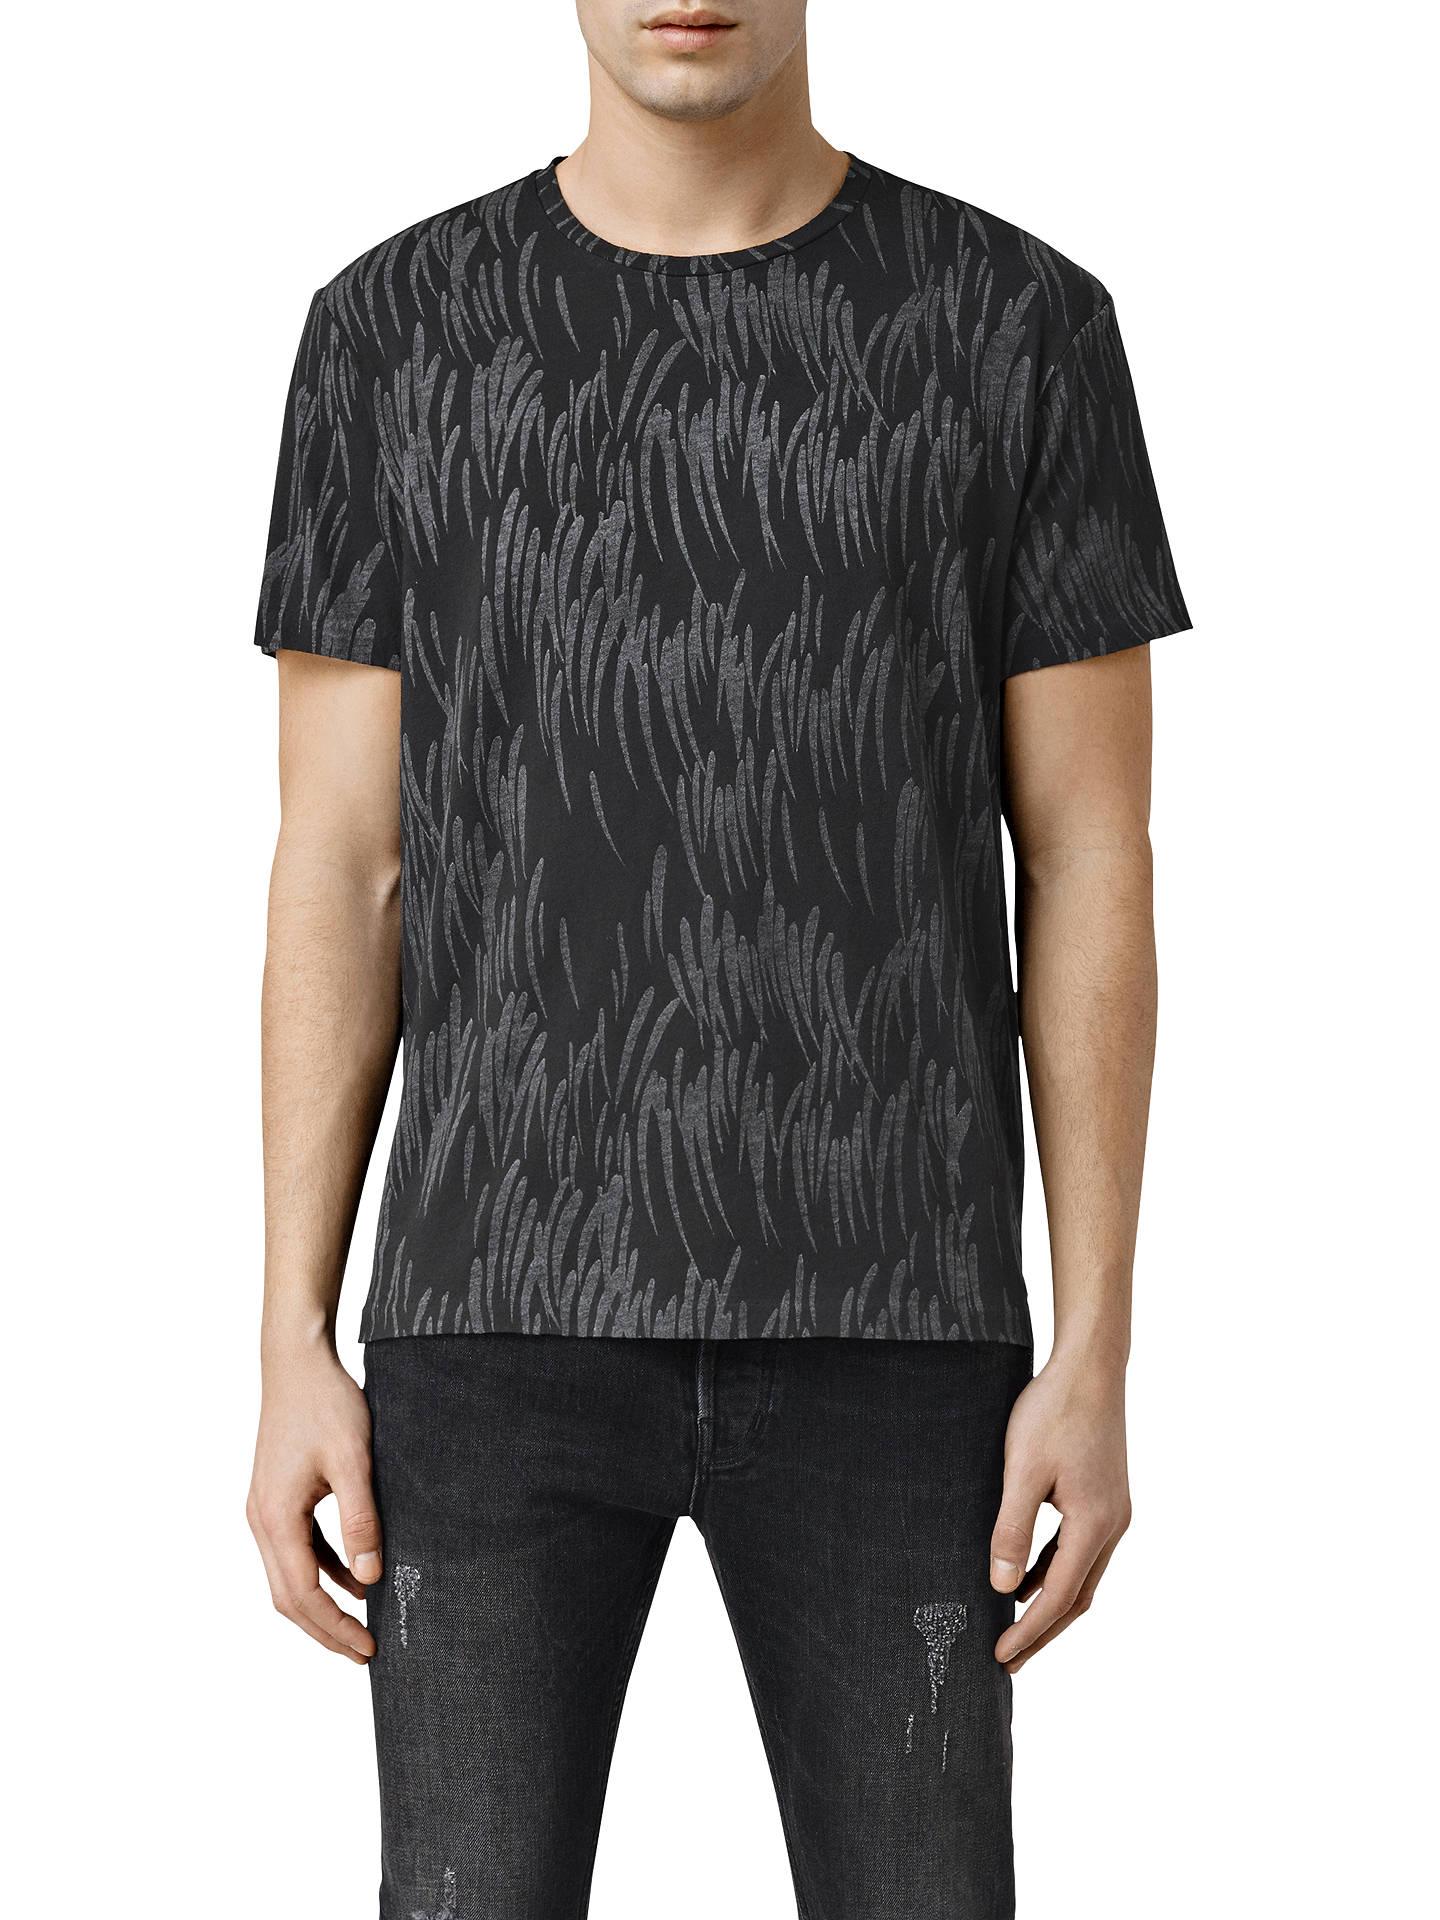 AllSaints Cyclone Printed Crew Neck T Shirt, Black at John